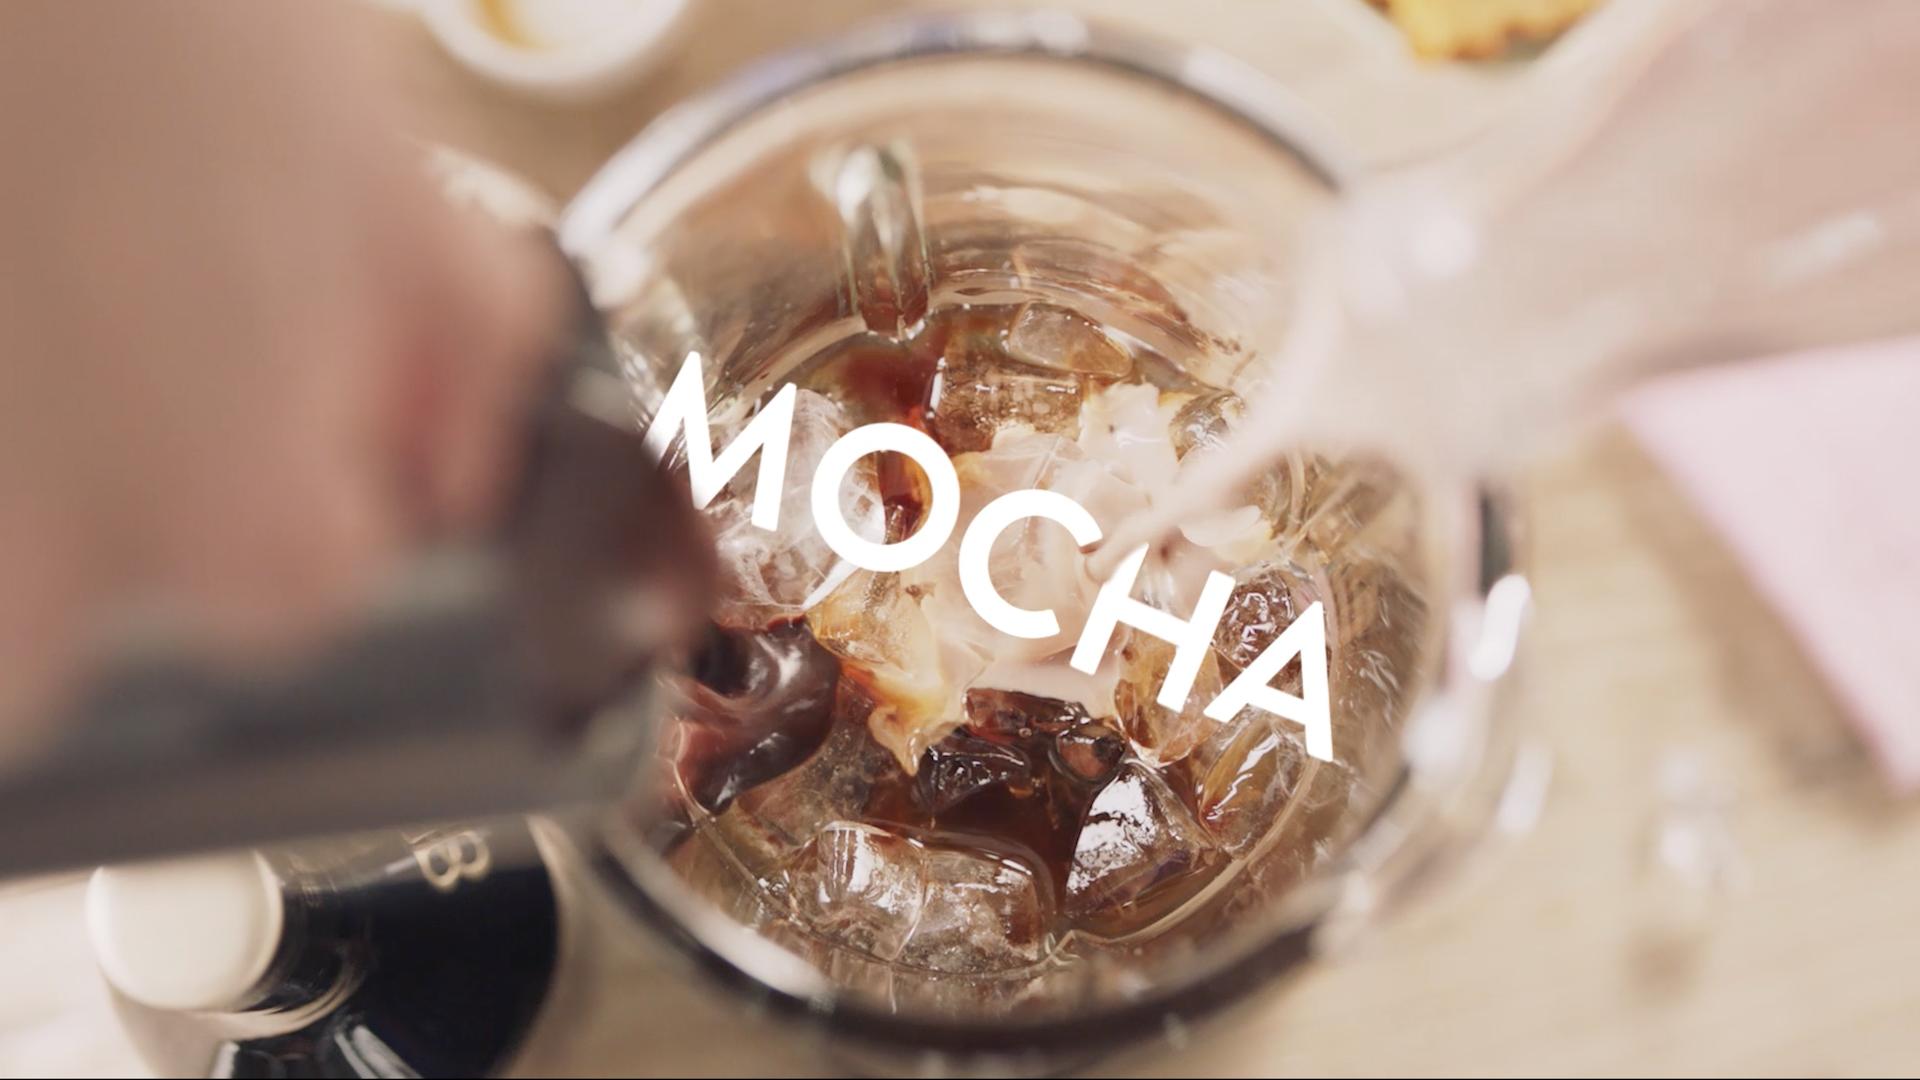 Baileys / Chocaccino